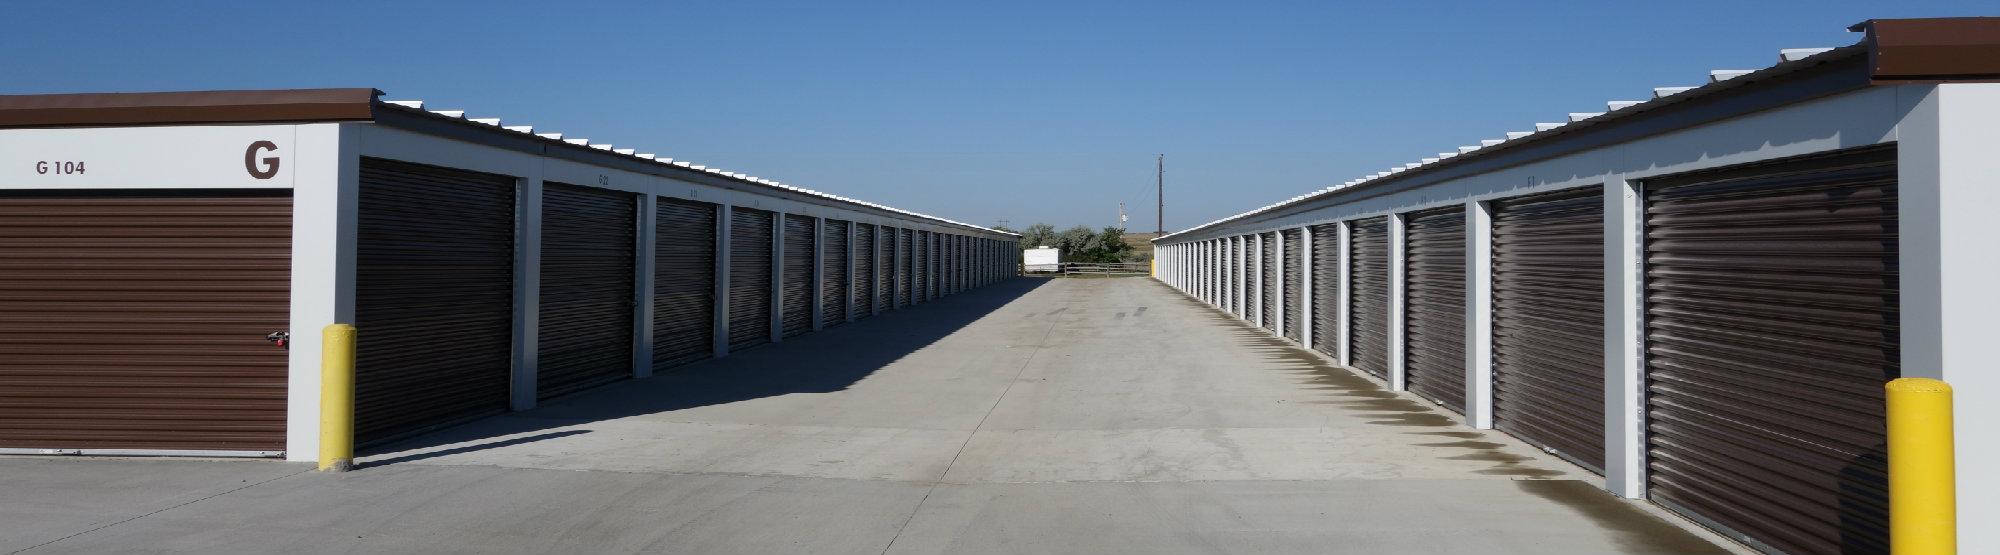 Schatz Storage buildings